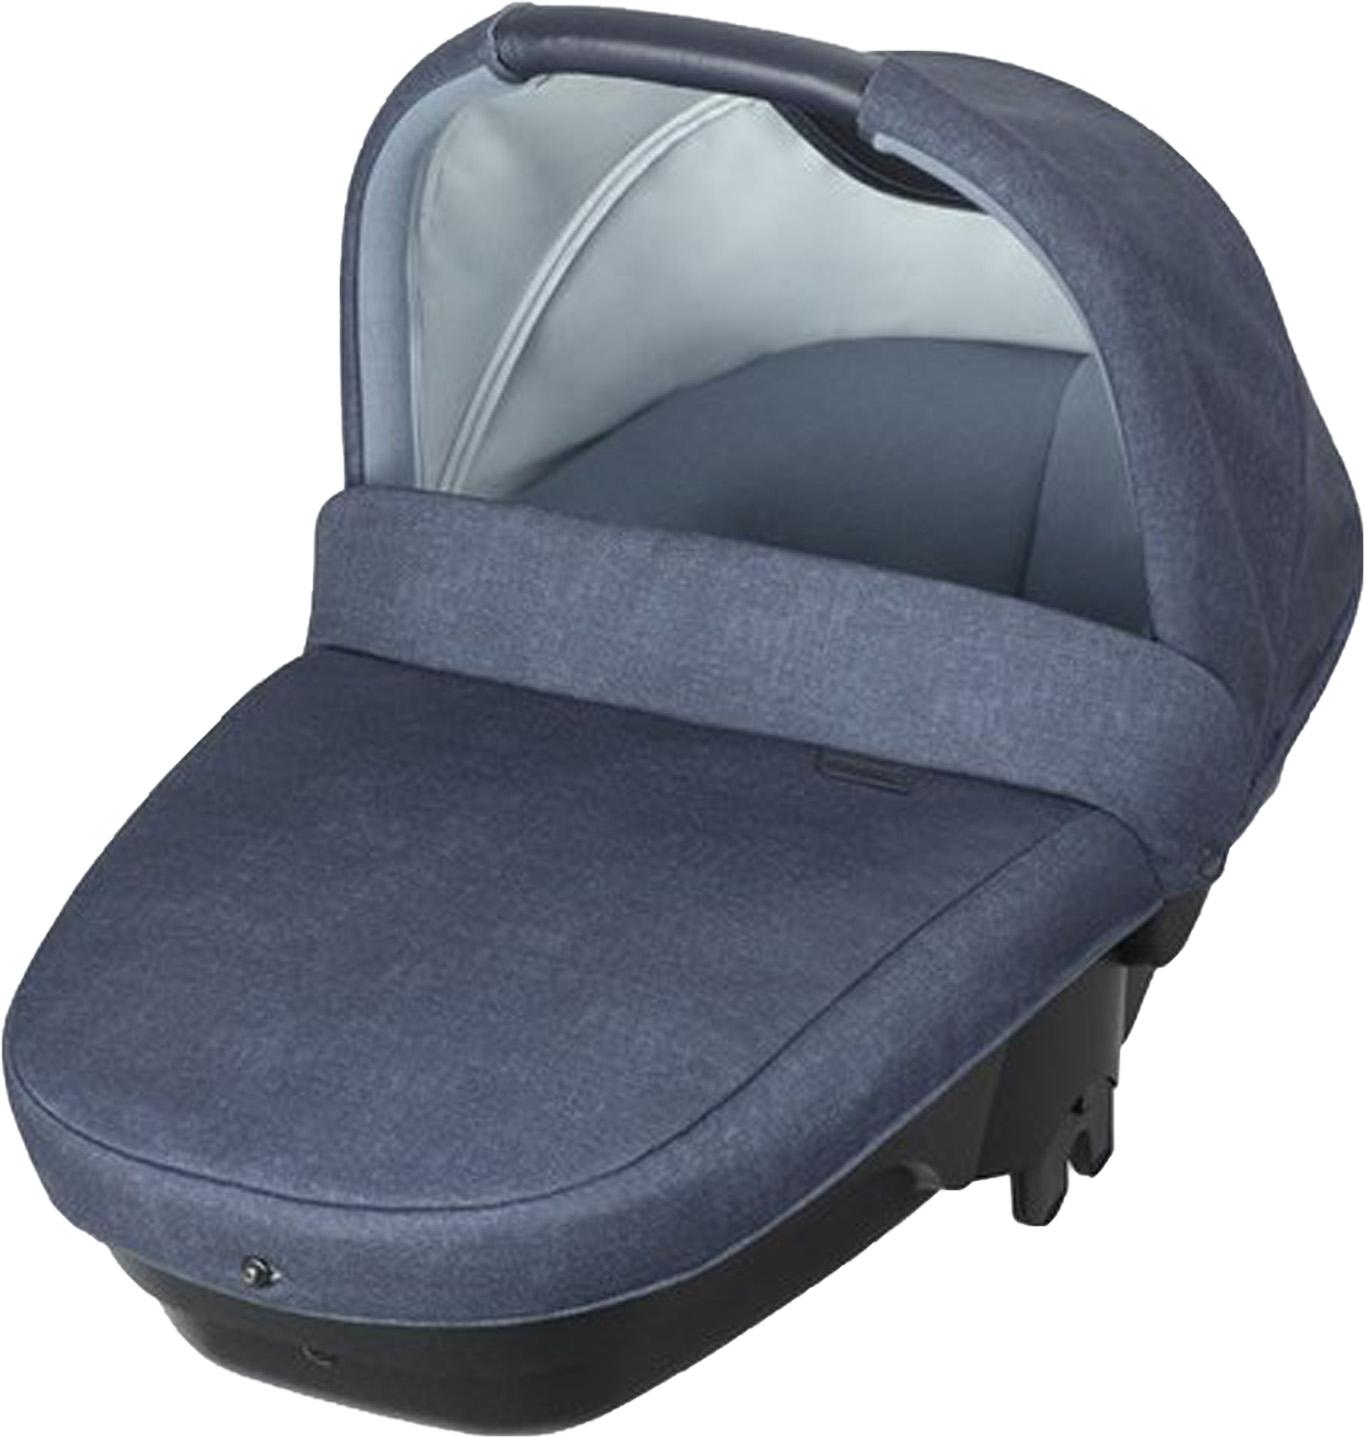 цена Люлька для коляски Bebe Confort Amber синий, темно-синий в интернет-магазинах